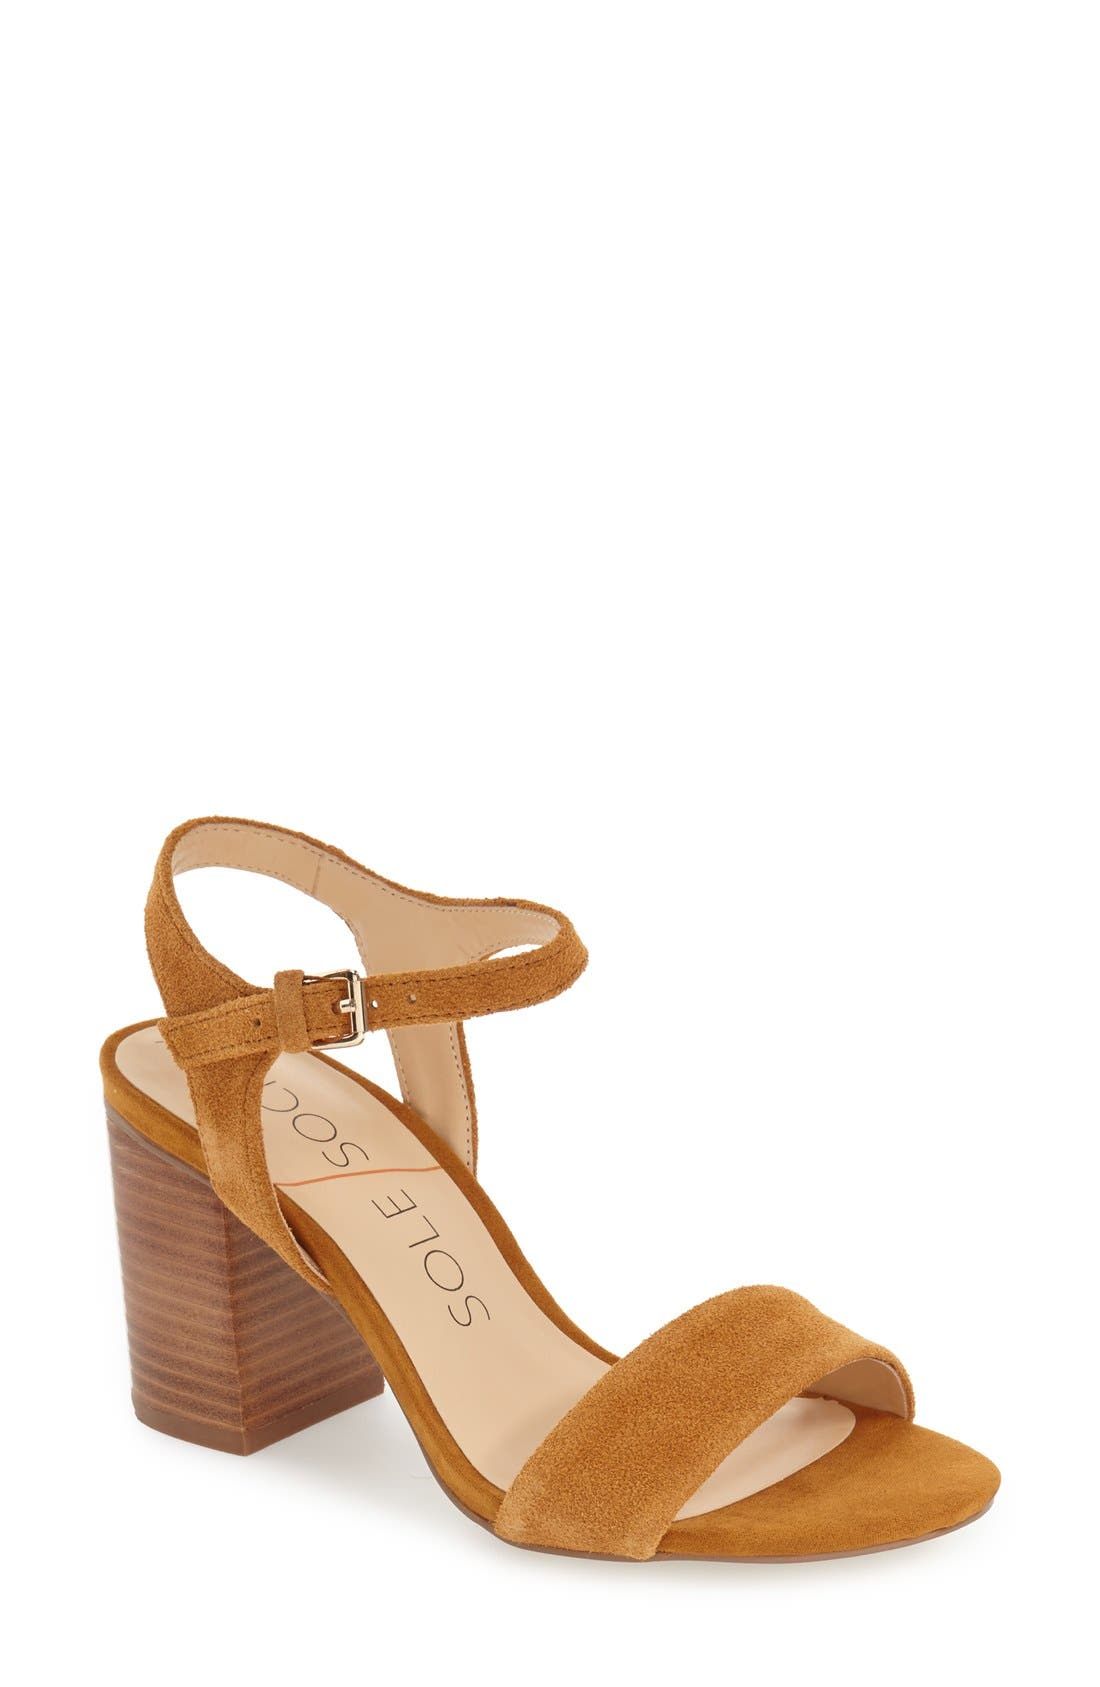 'Linny' Ankle Strap Sandal,                             Main thumbnail 4, color,